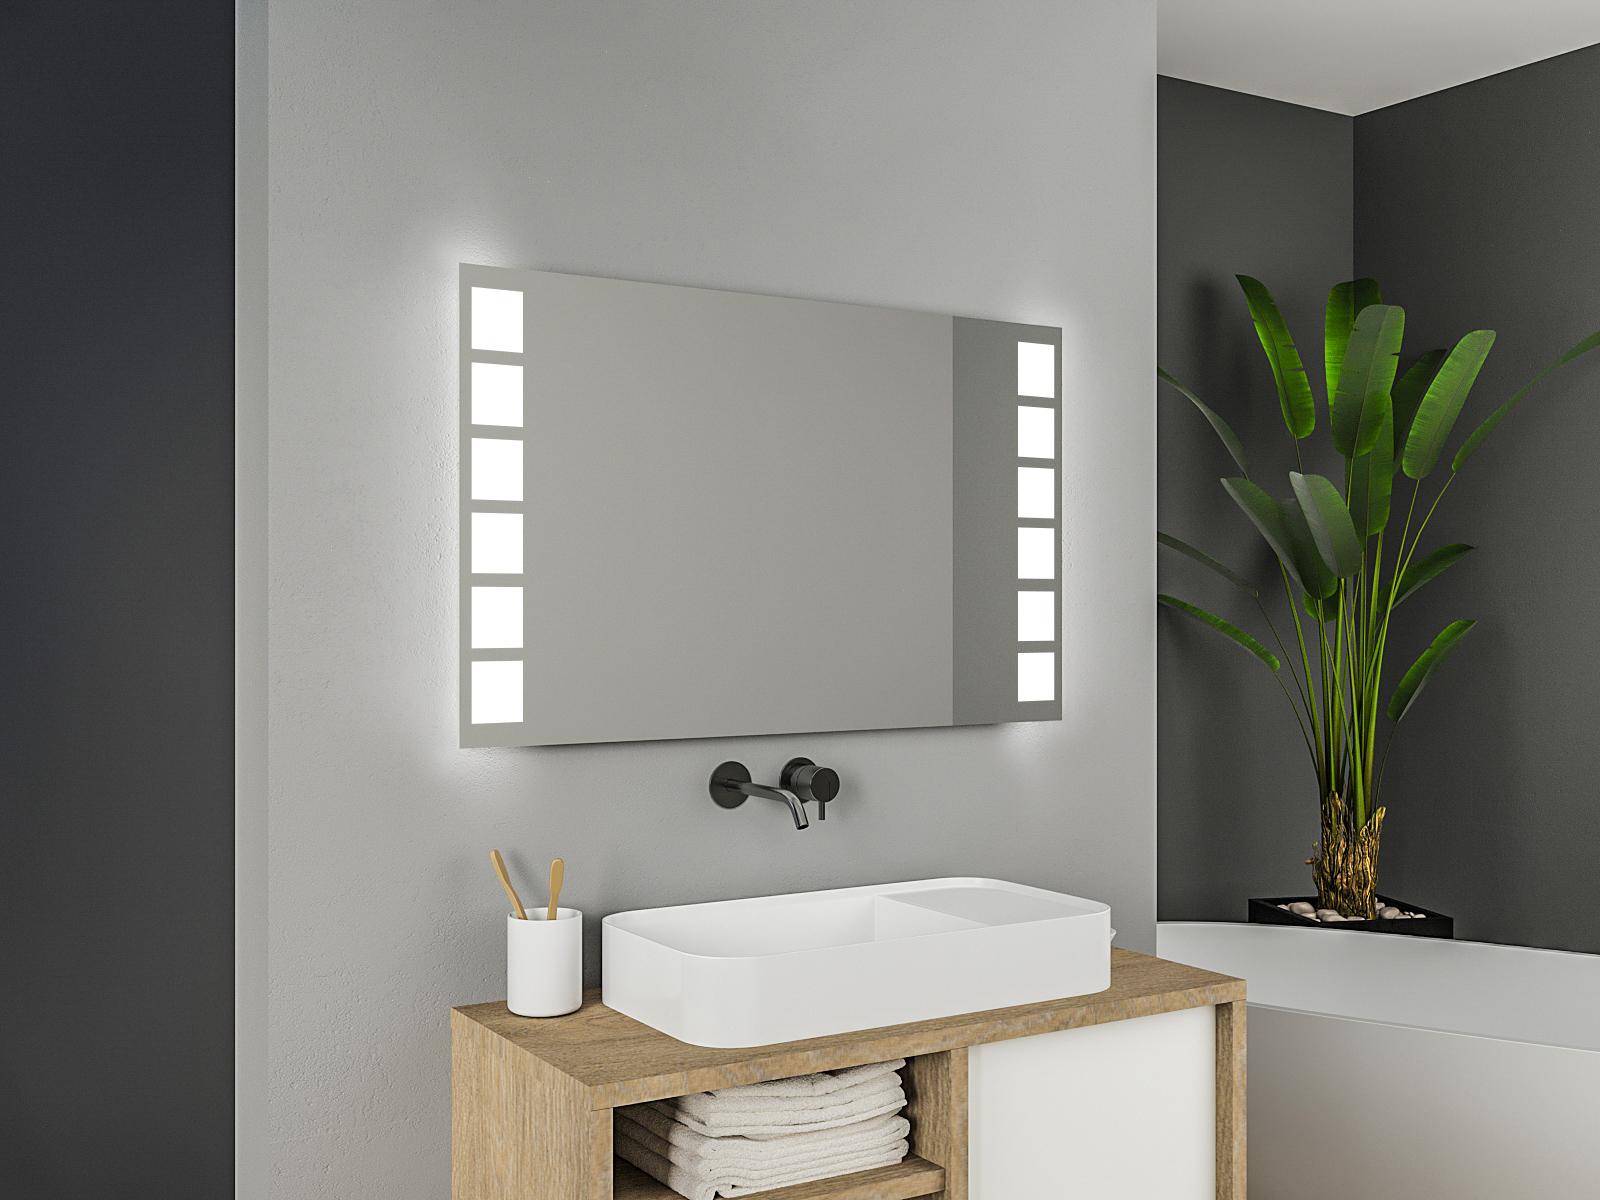 Badspiegel mit LED Beleuchtung - Sophia